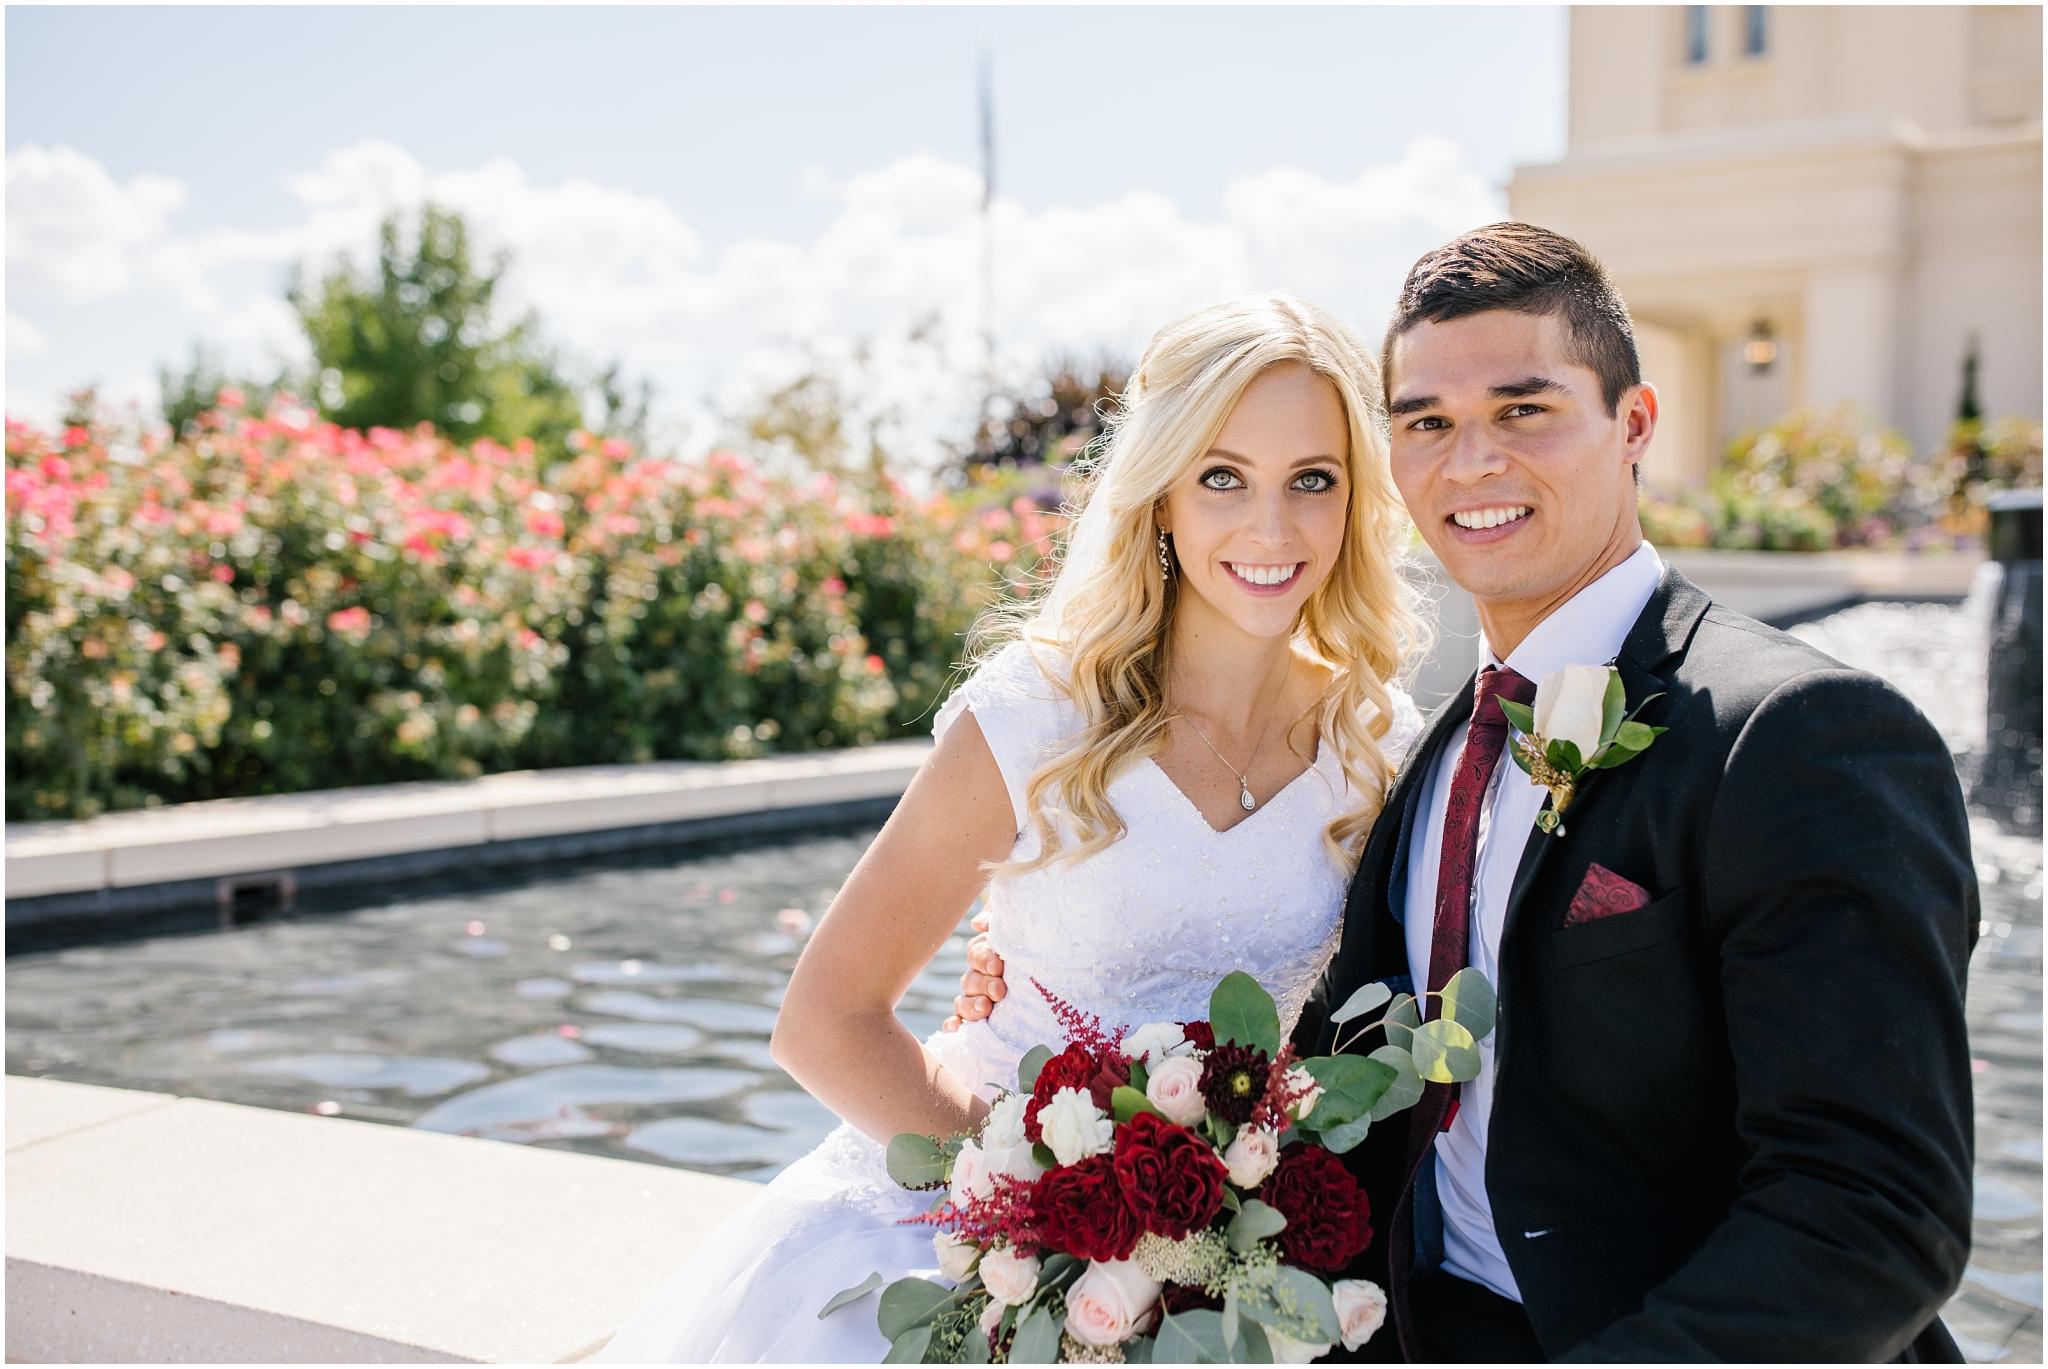 HannahChaseWedding-188_Lizzie-B-Imagery-Utah-Wedding-Photographer-Park-City-Salt-Lake-City-Payson-Temple-Clarion-Garden-Center.jpg